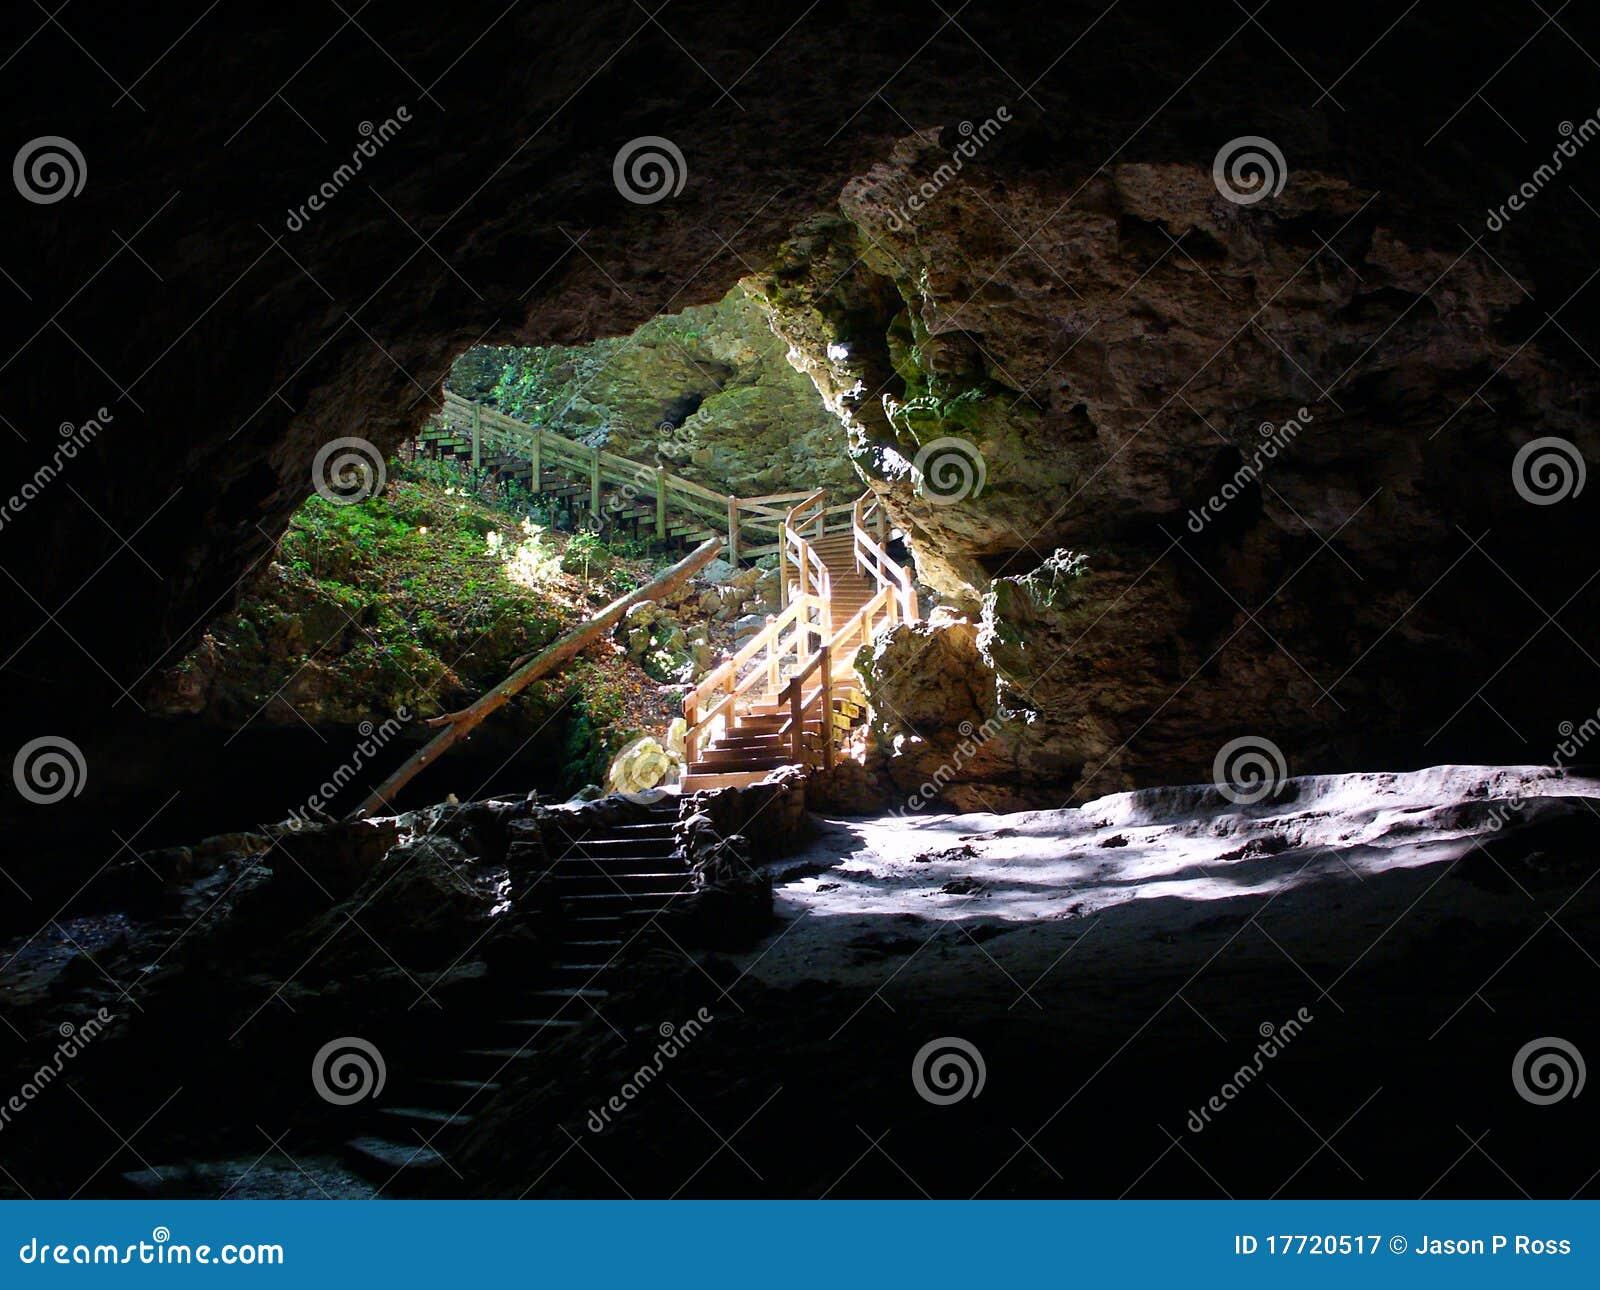 Maquoketa Caves State Park - Iowa Stock Image - Image of opening ...